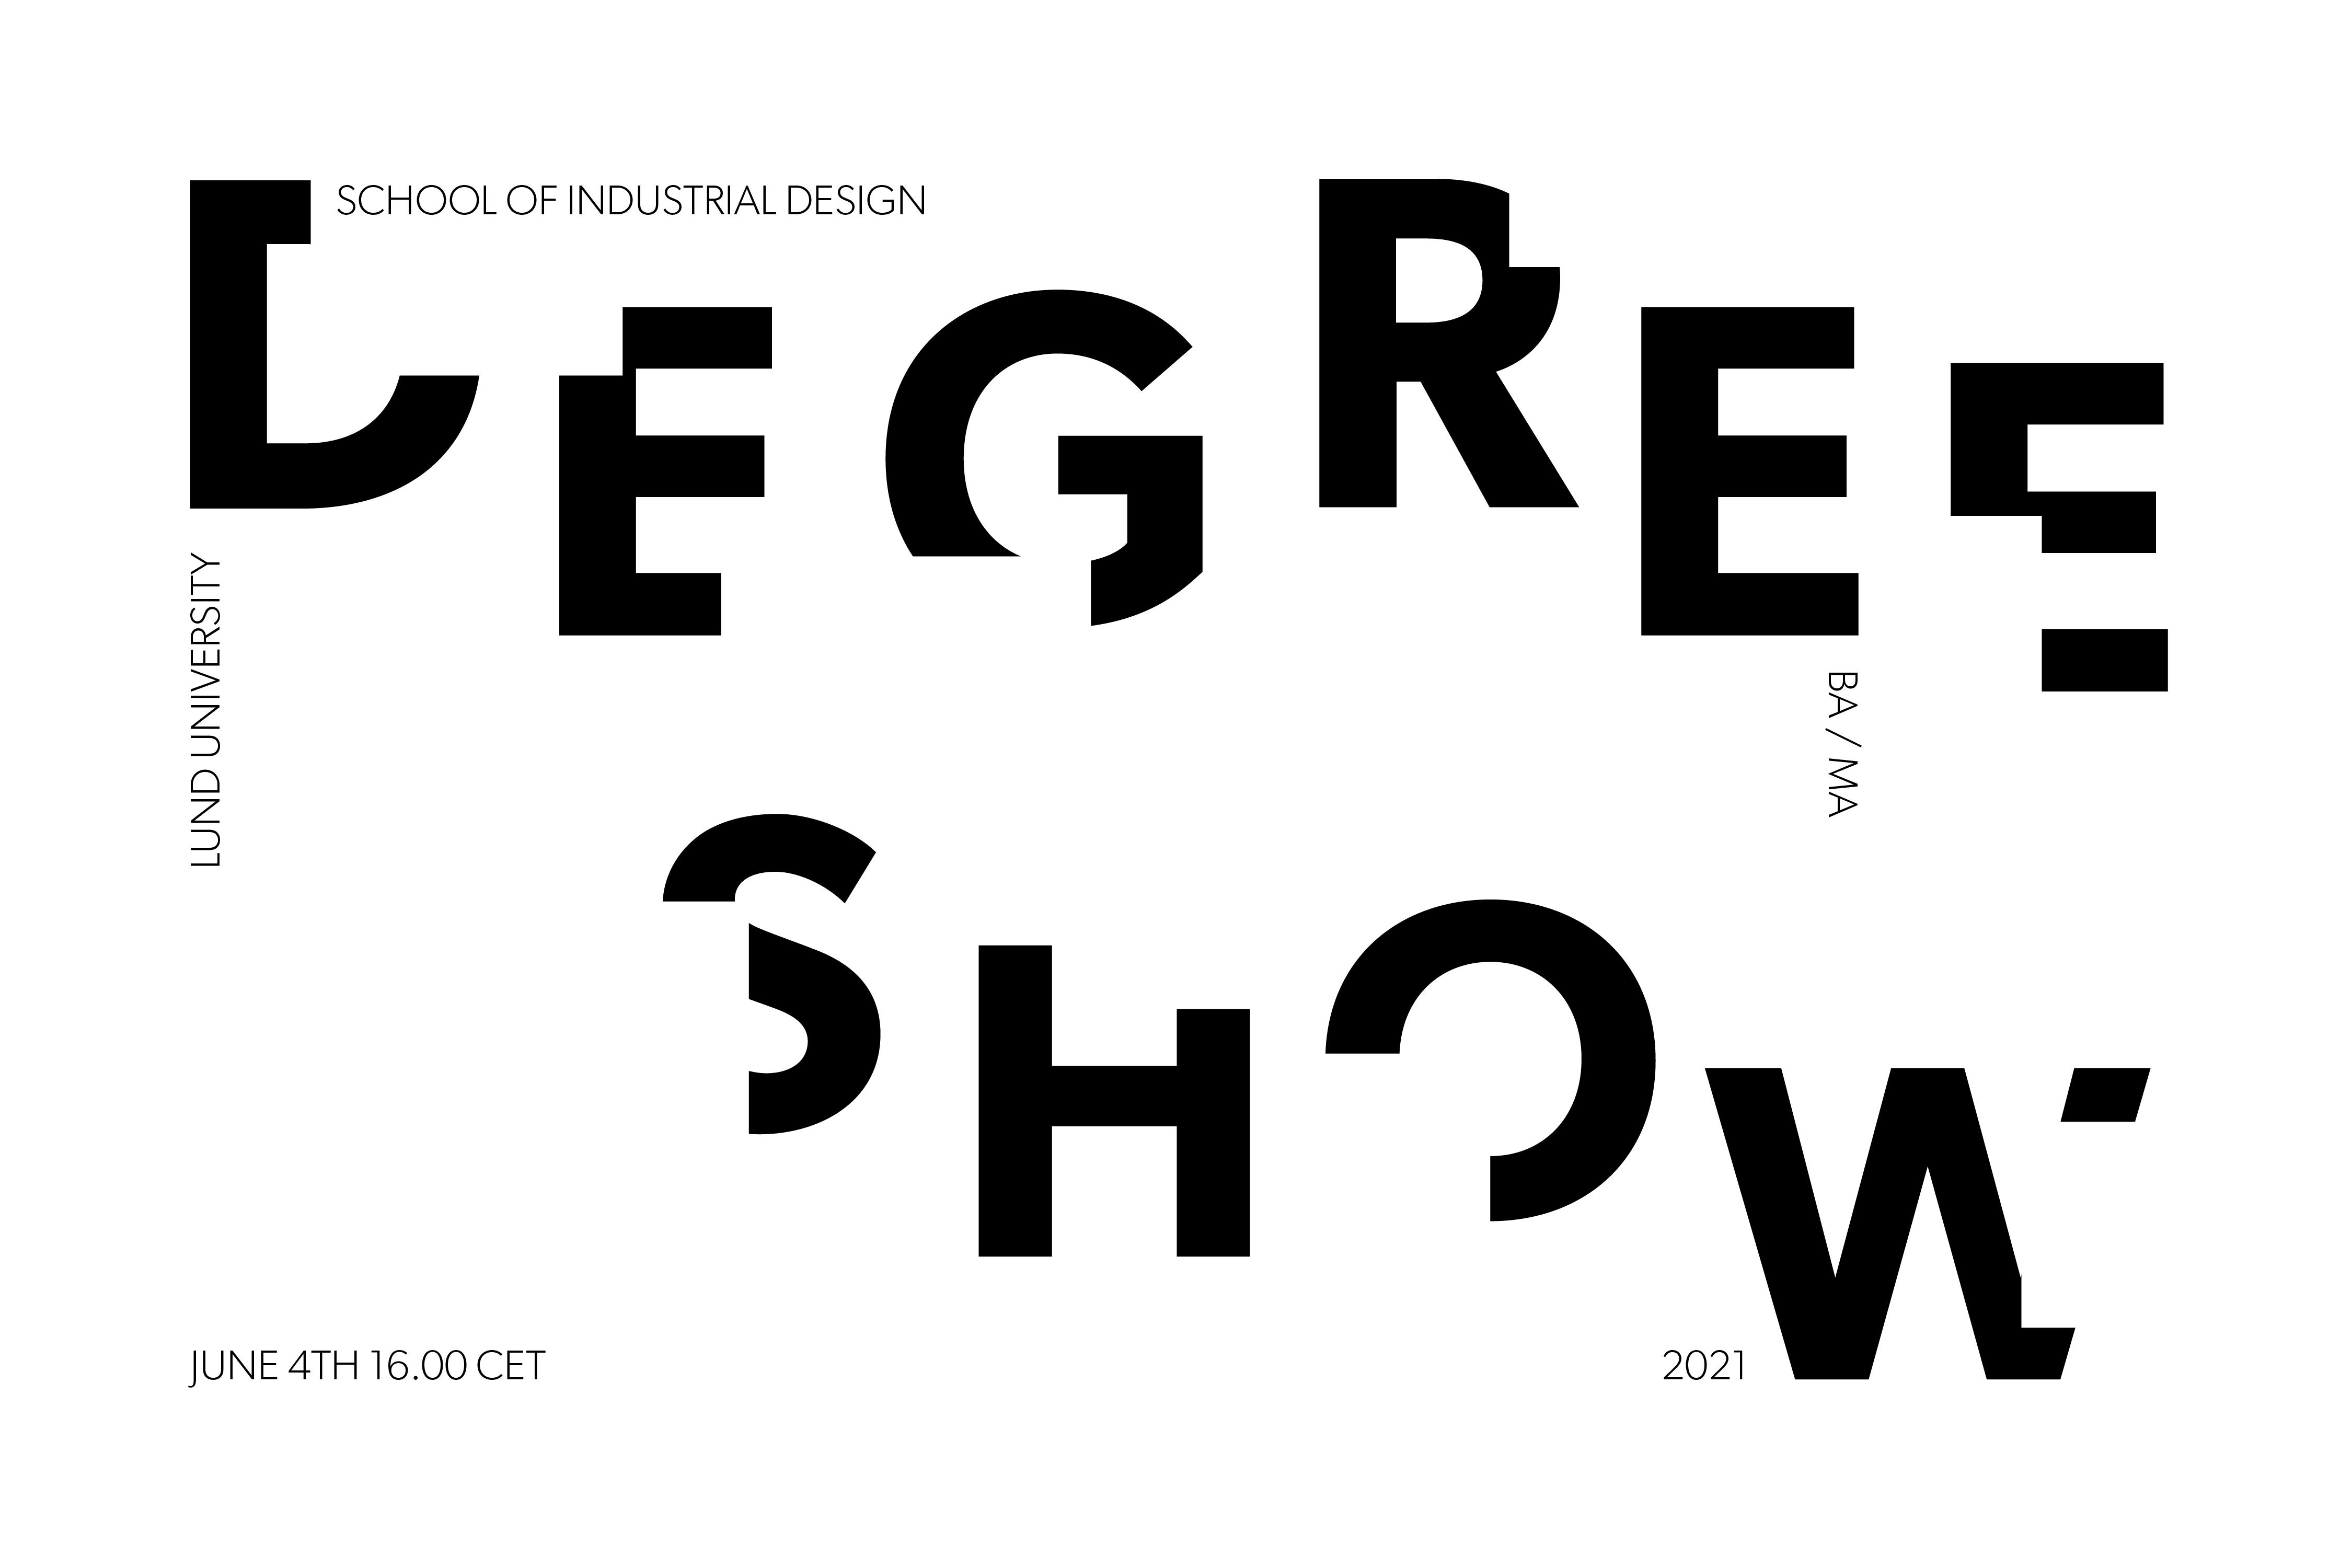 BA/MA Degree Show 2021 - June 4th 16.00 CET